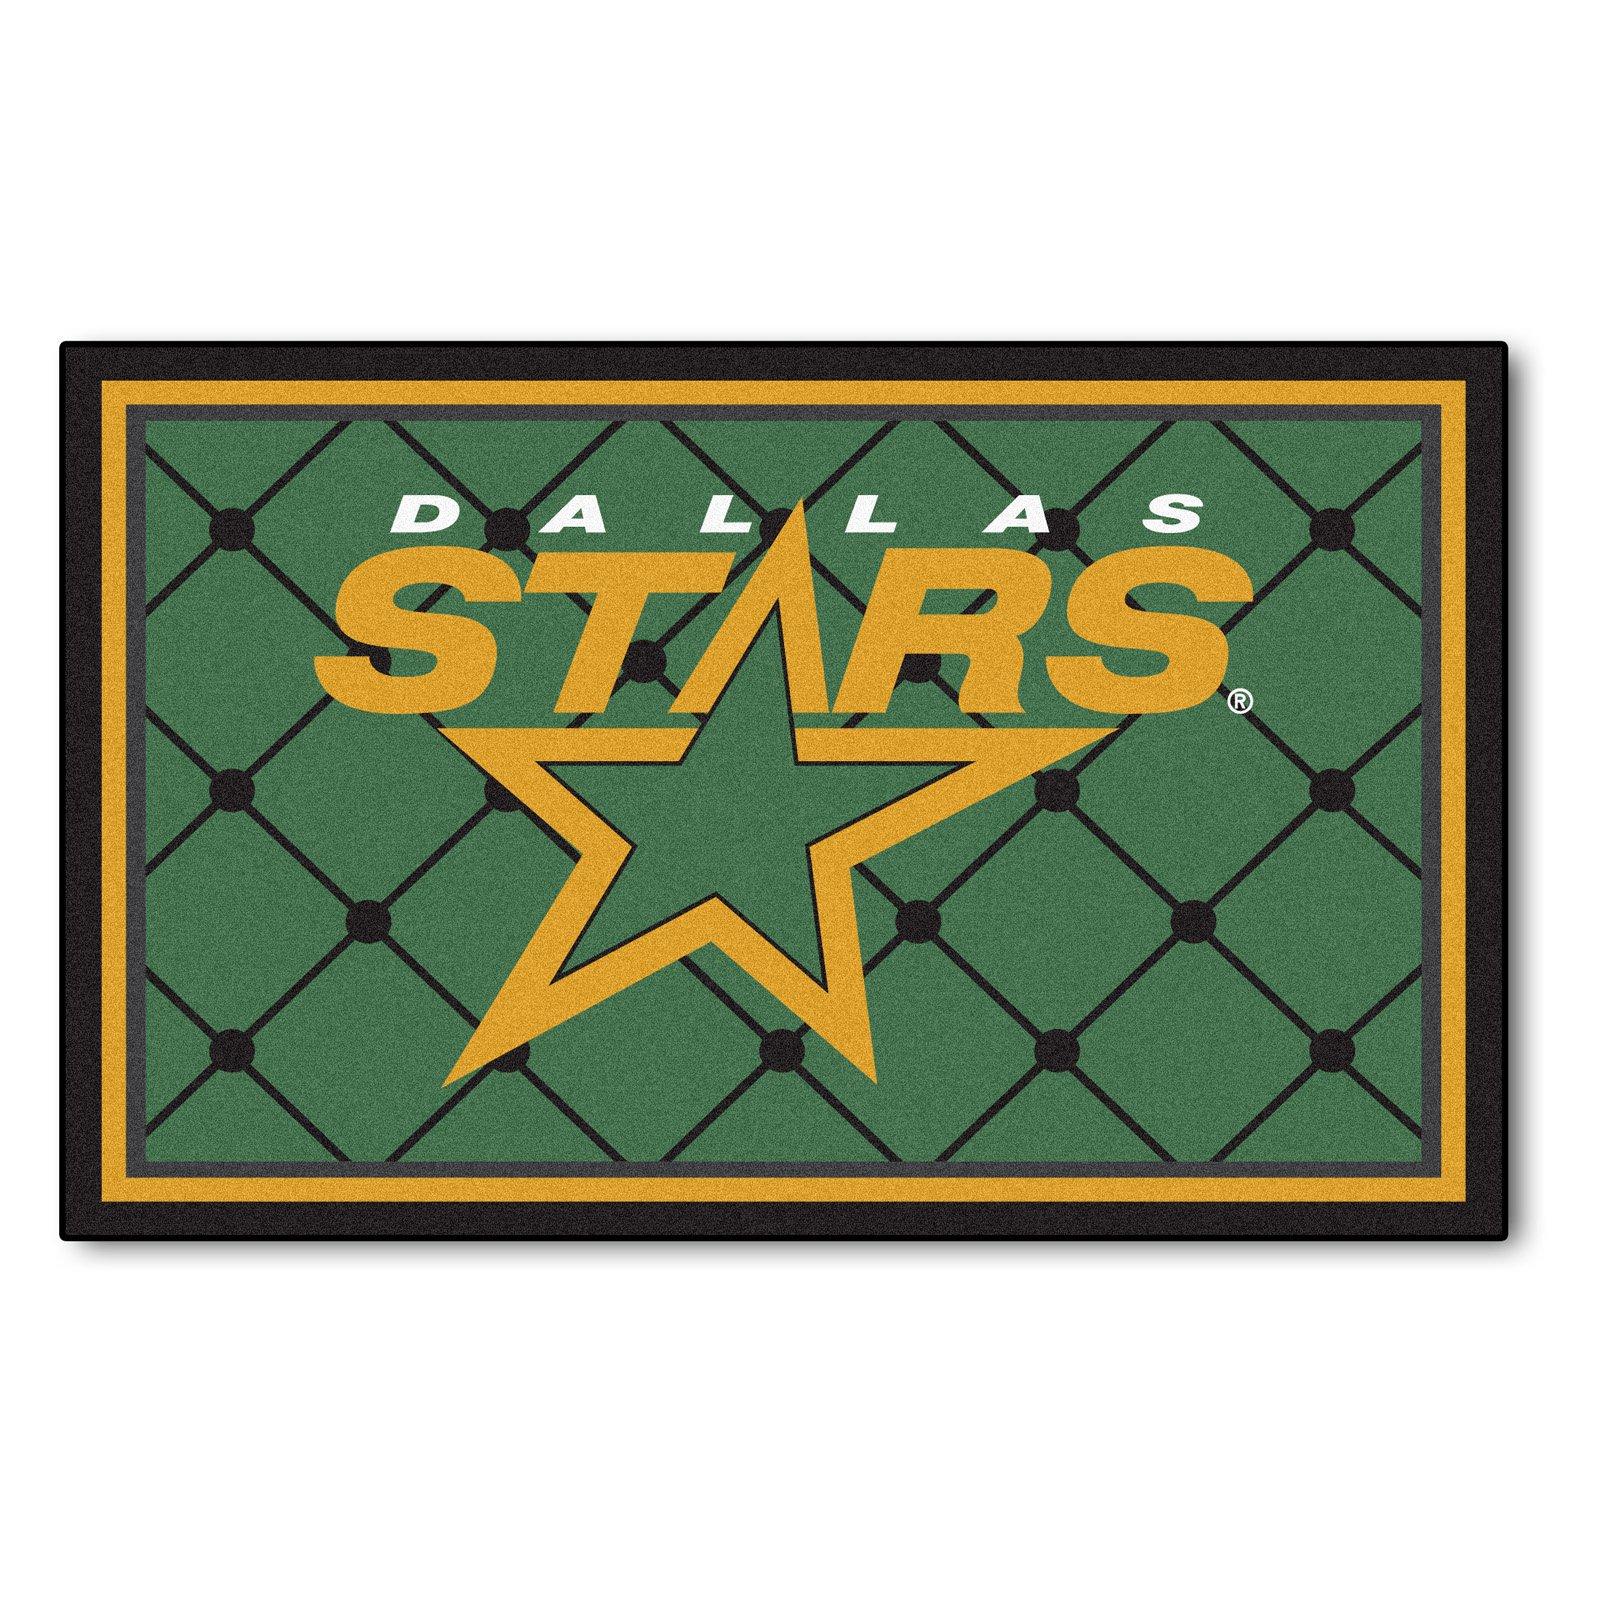 NHL - Dallas Stars 4'x6' Rug